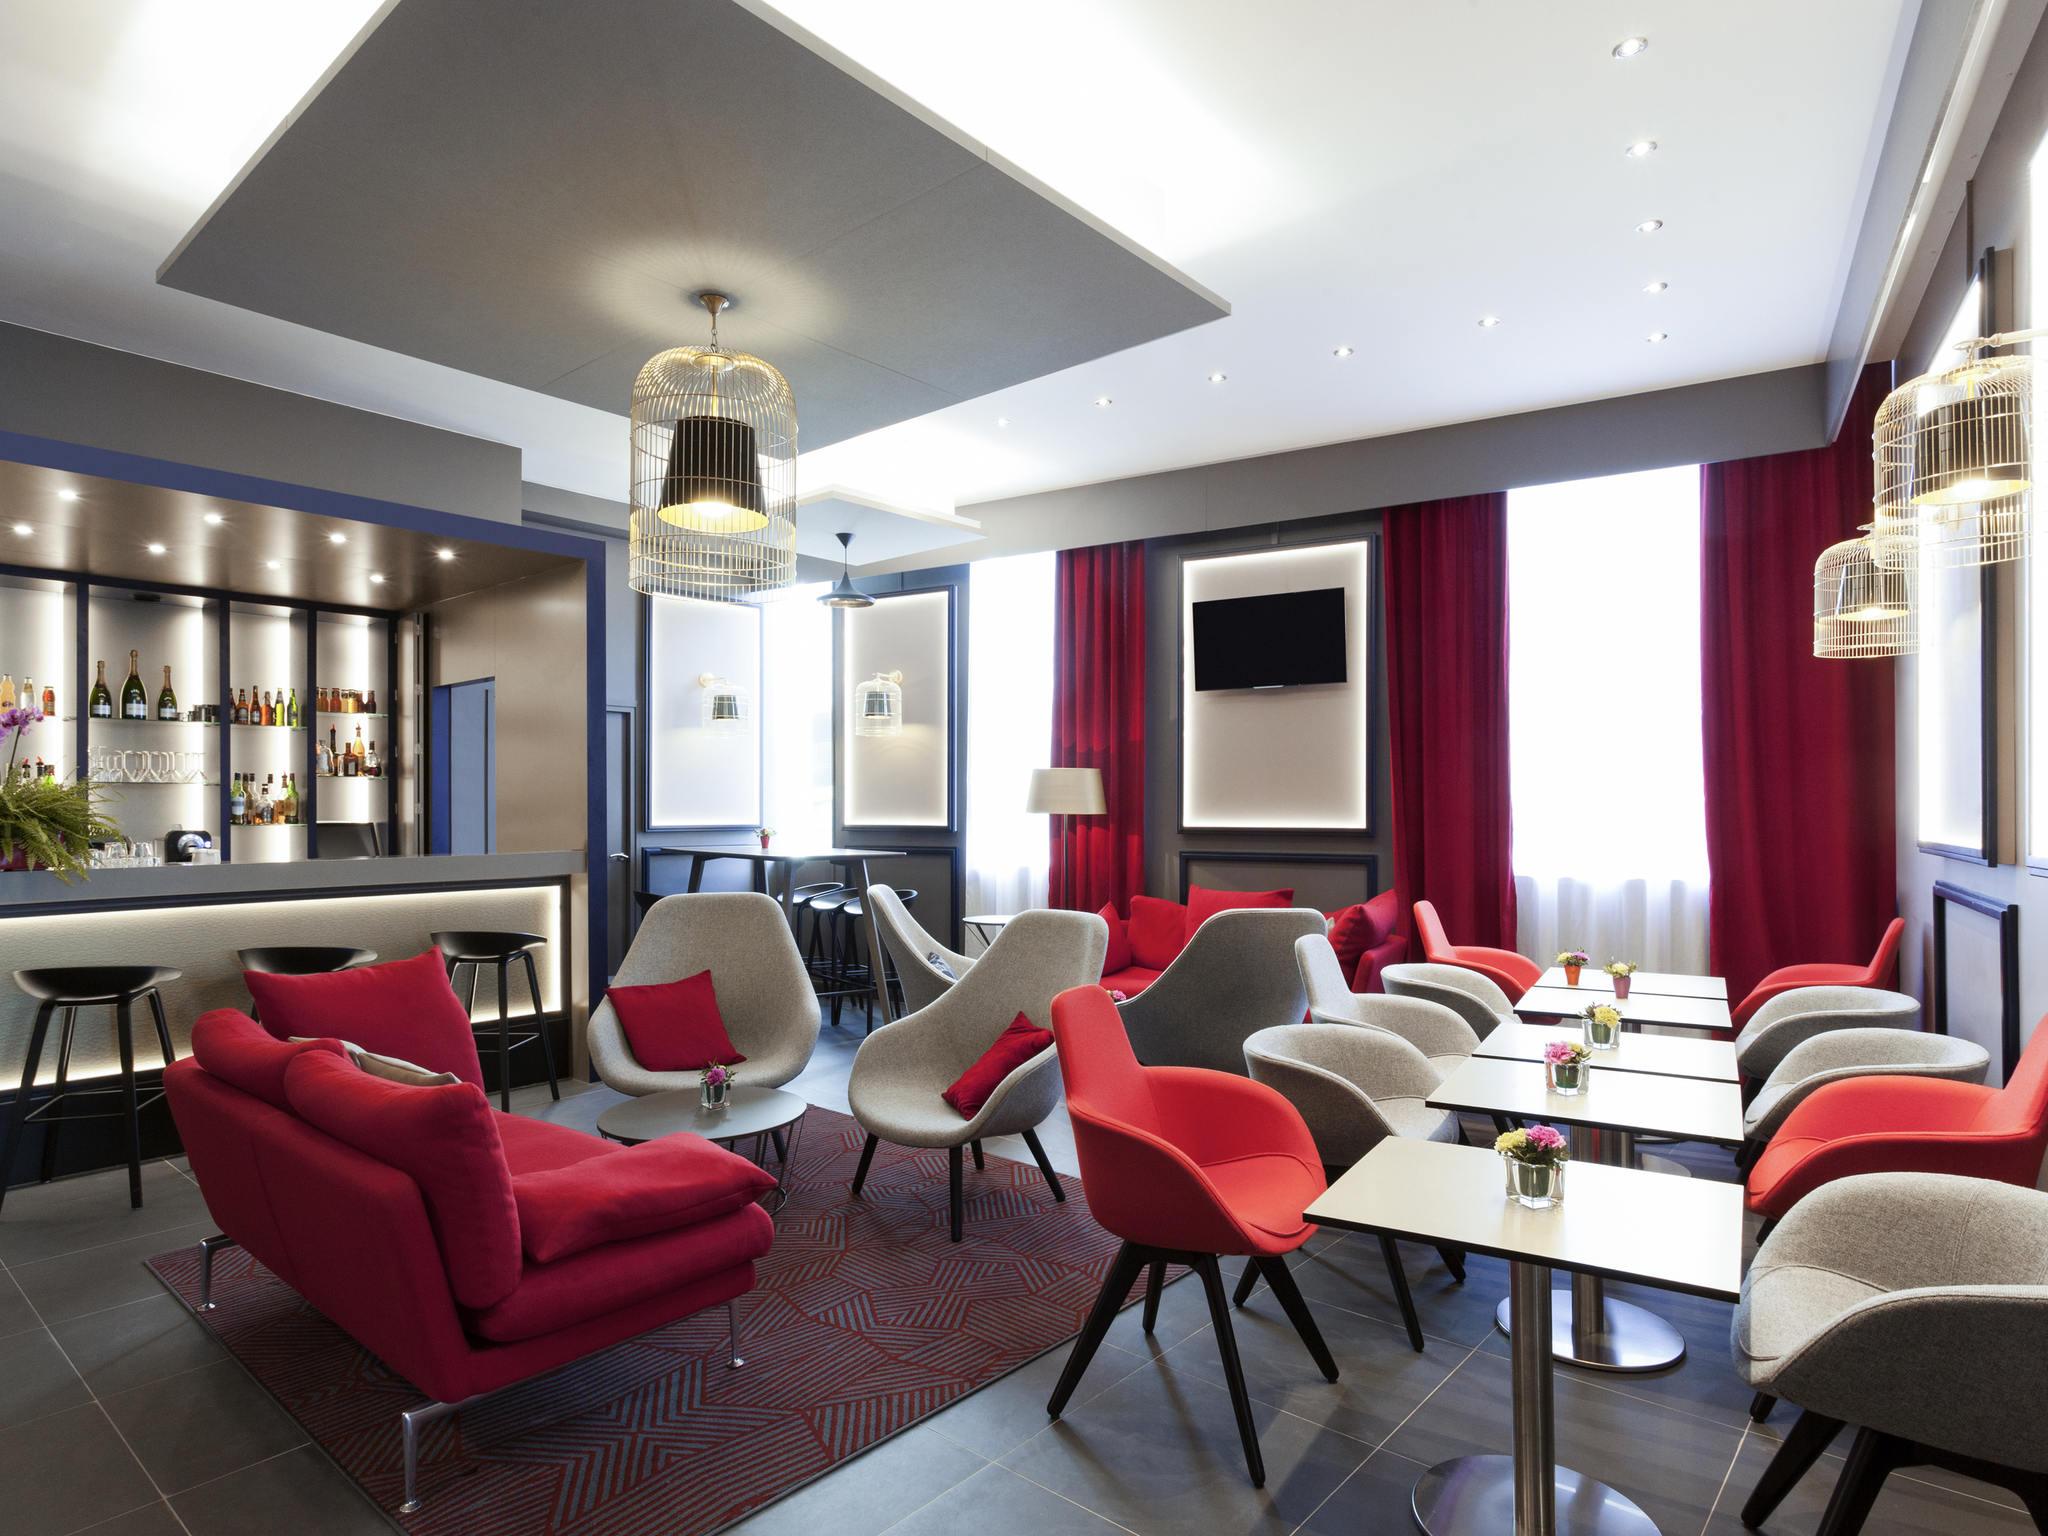 Novotel hotel paris france 2018 world 39 s best hotels for Hotel im paris